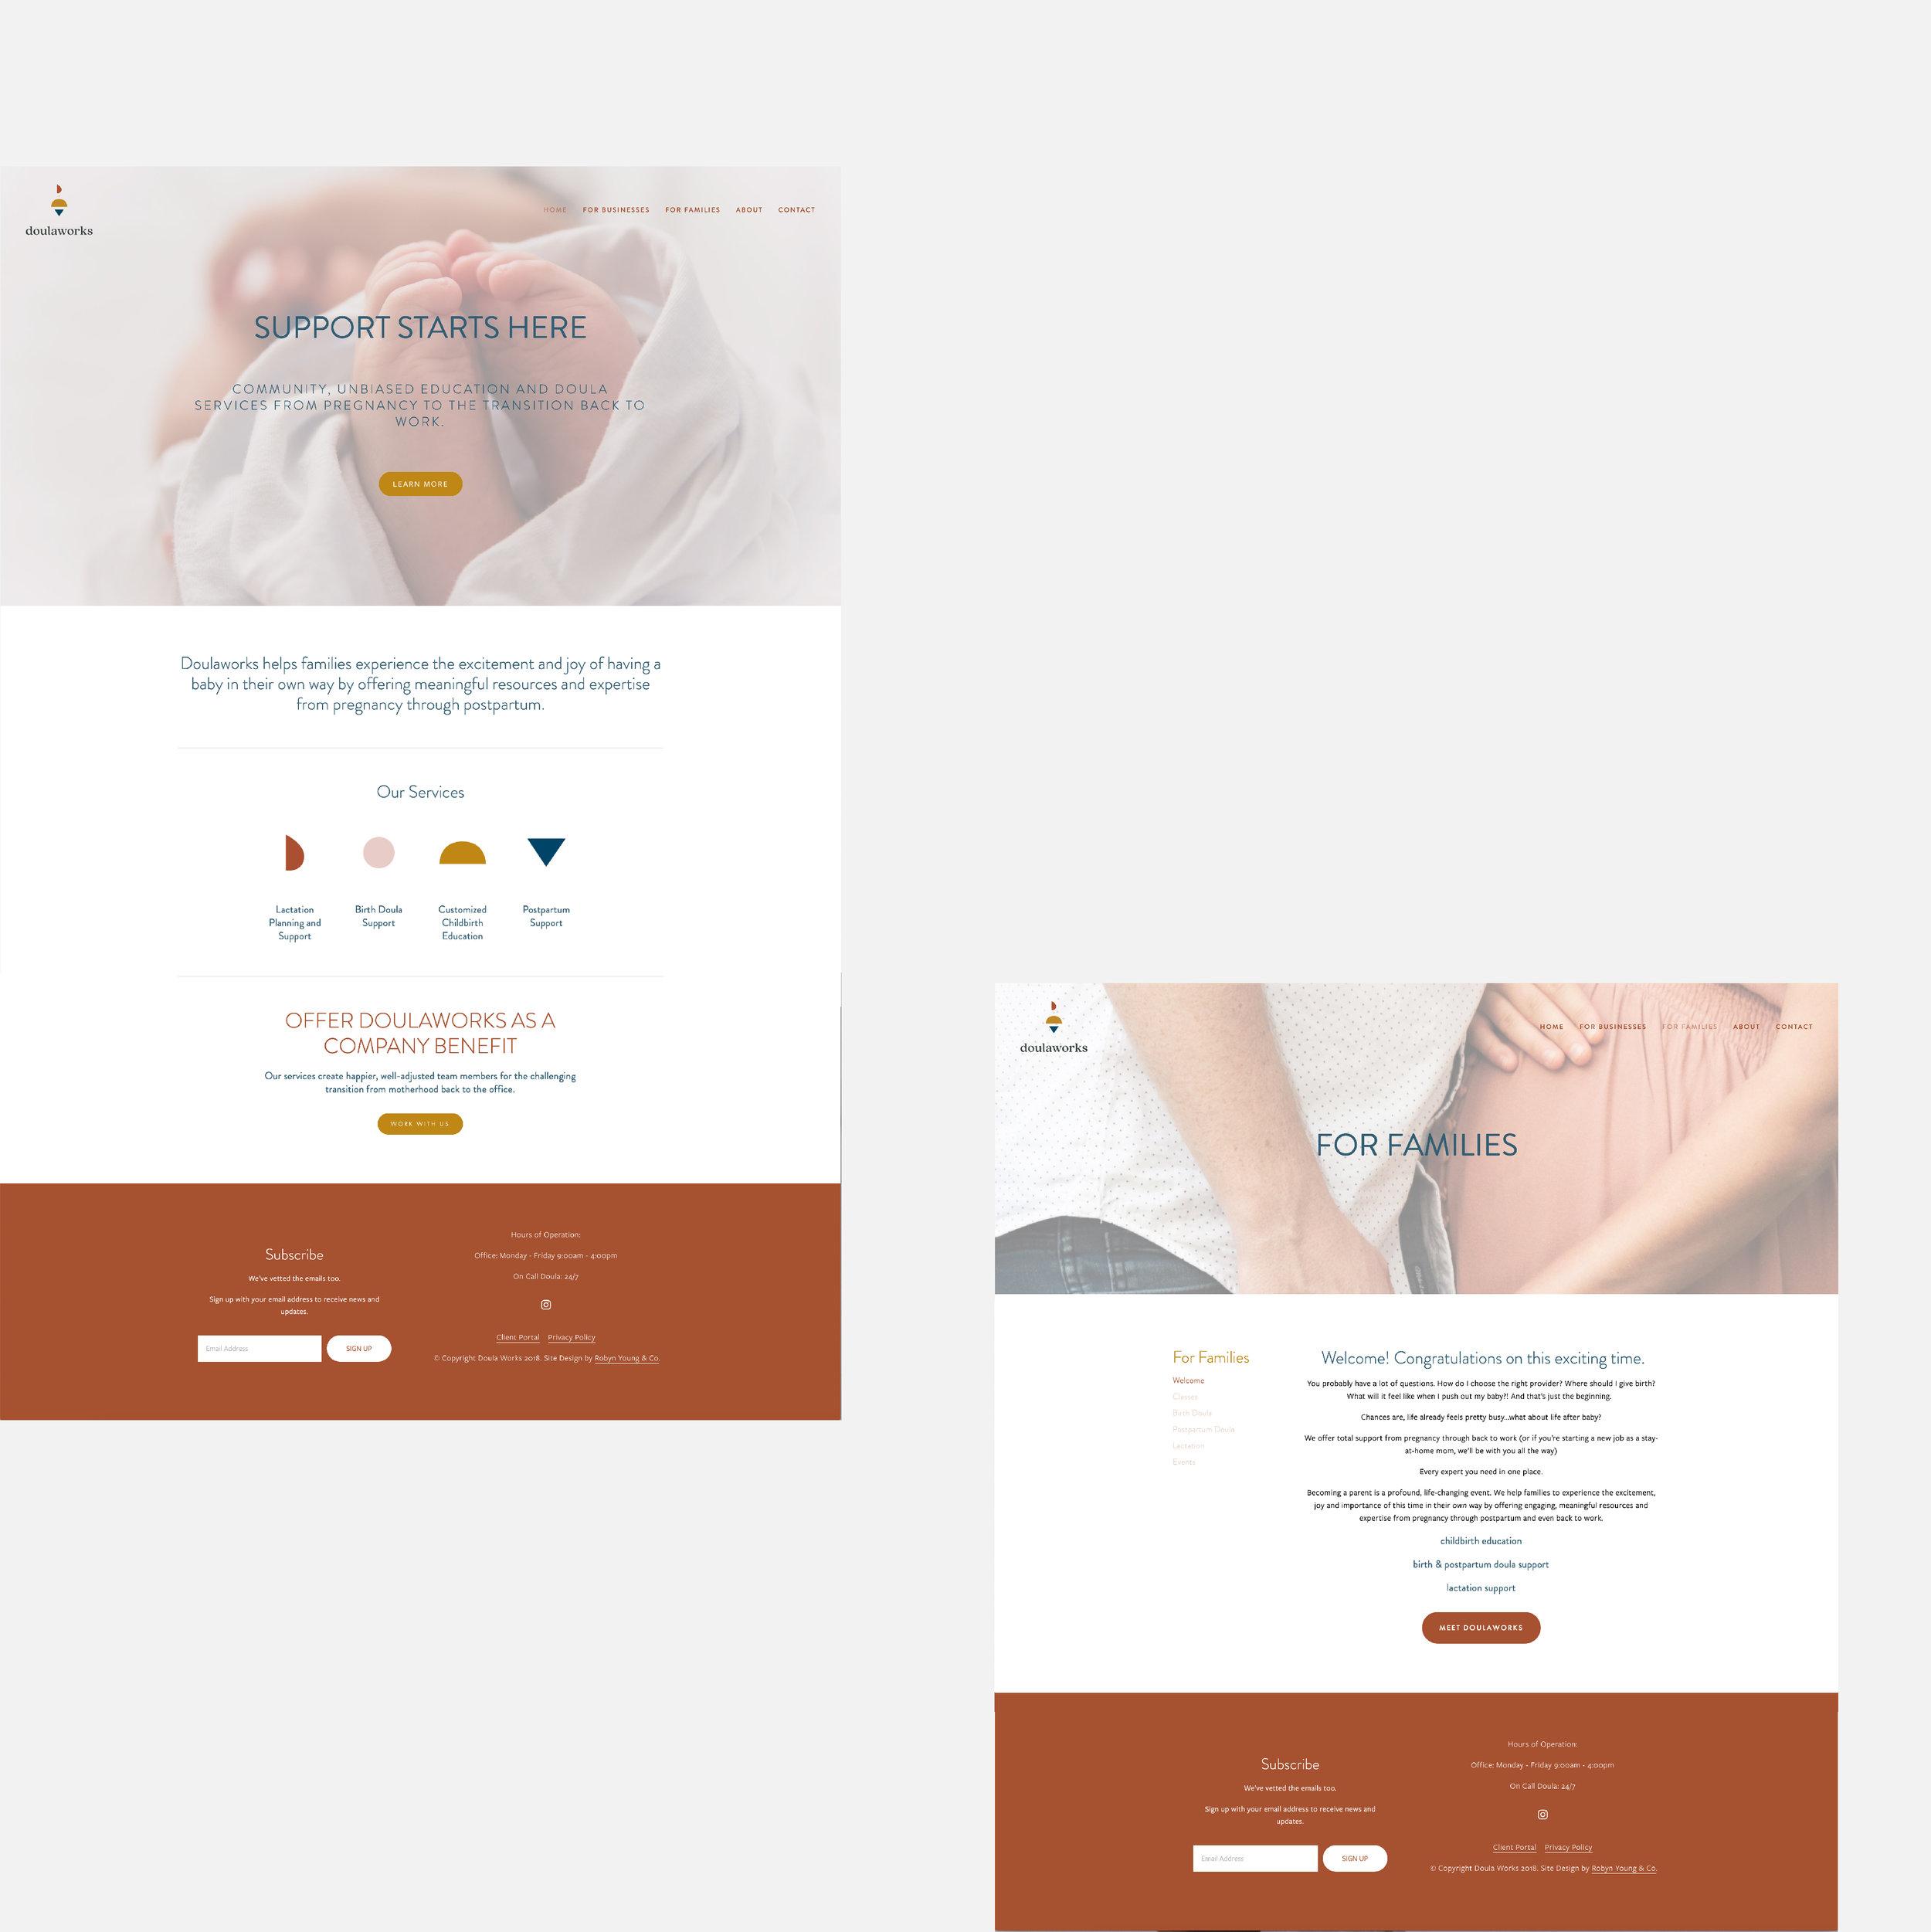 doula-works-website-design-los-angeles-doula-telltale-design